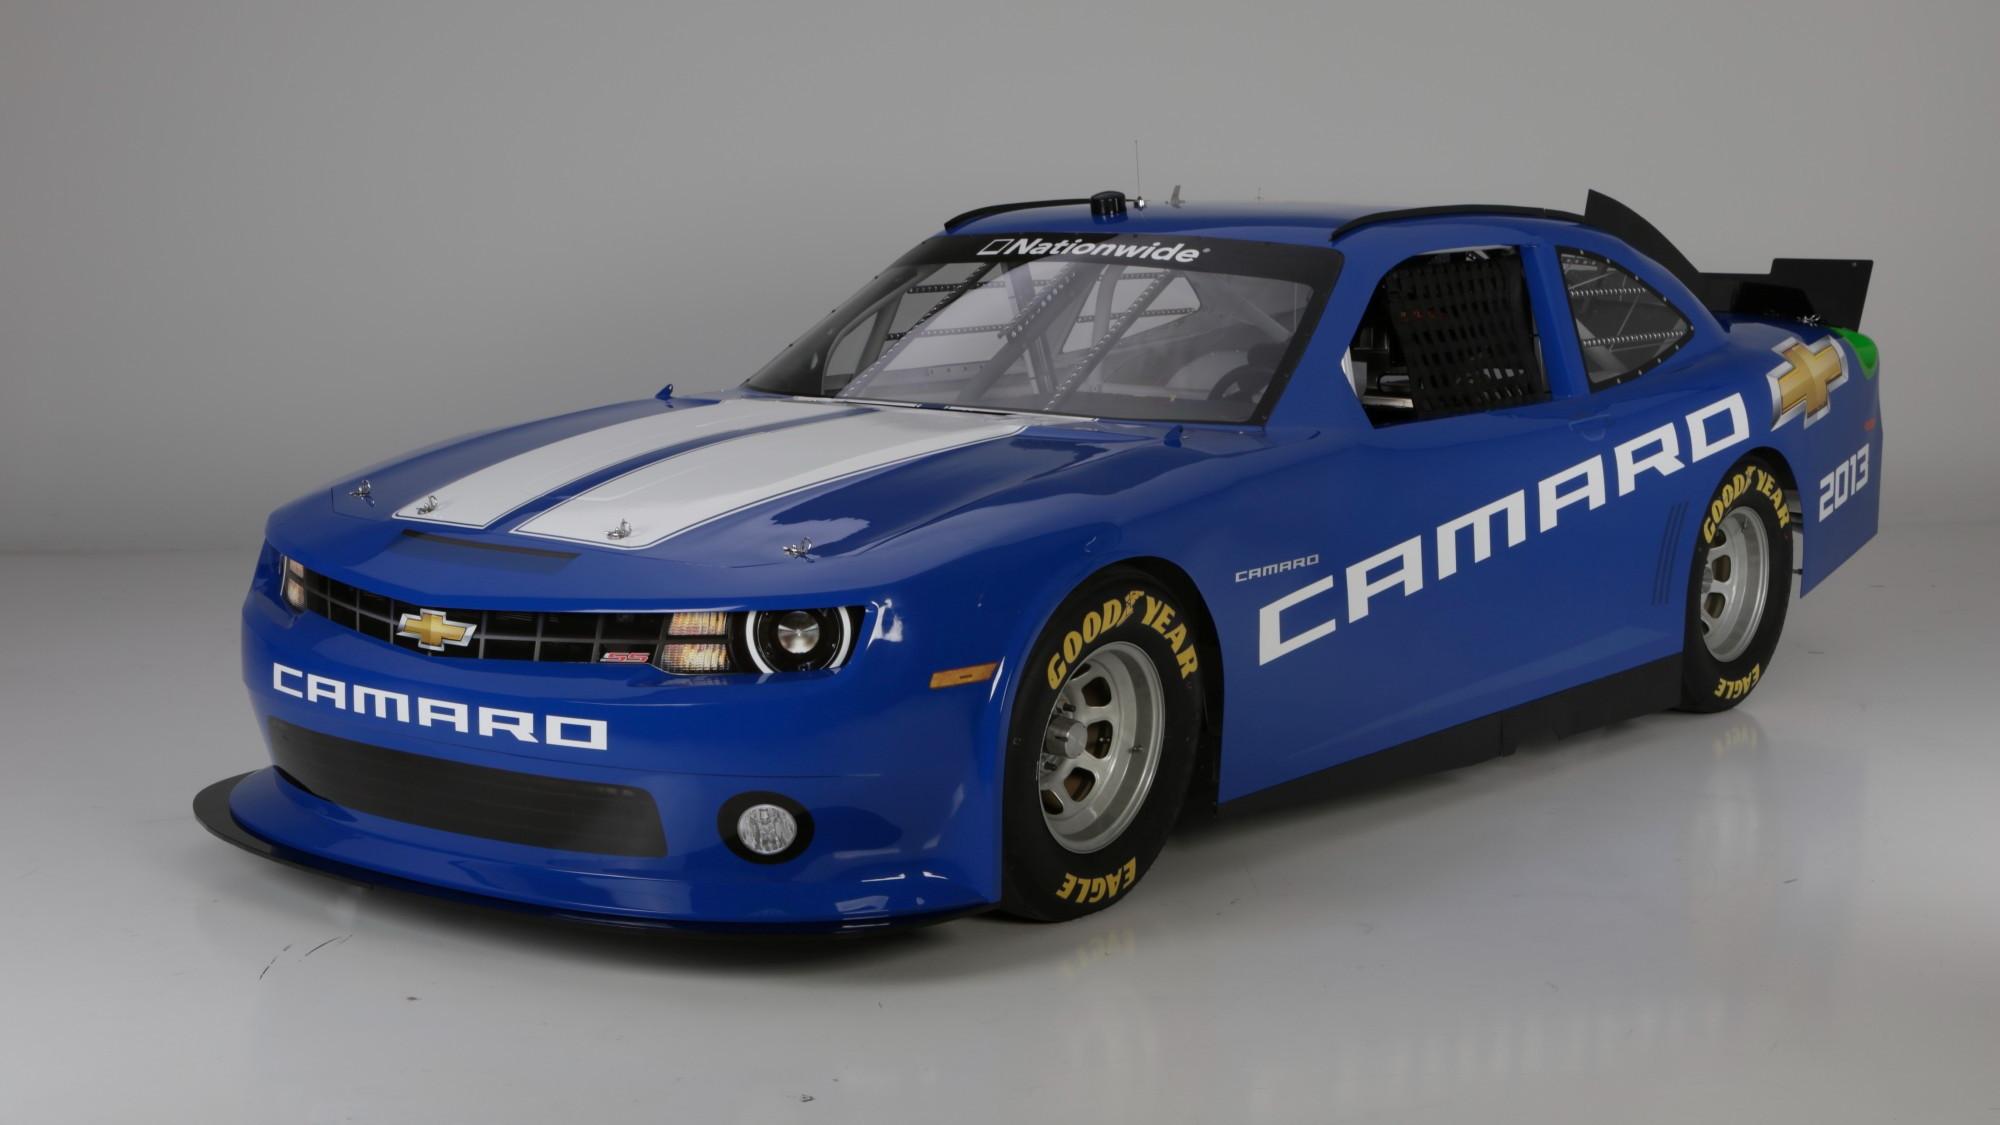 2013 Chevy Camaro NASCAR Nationwide race car